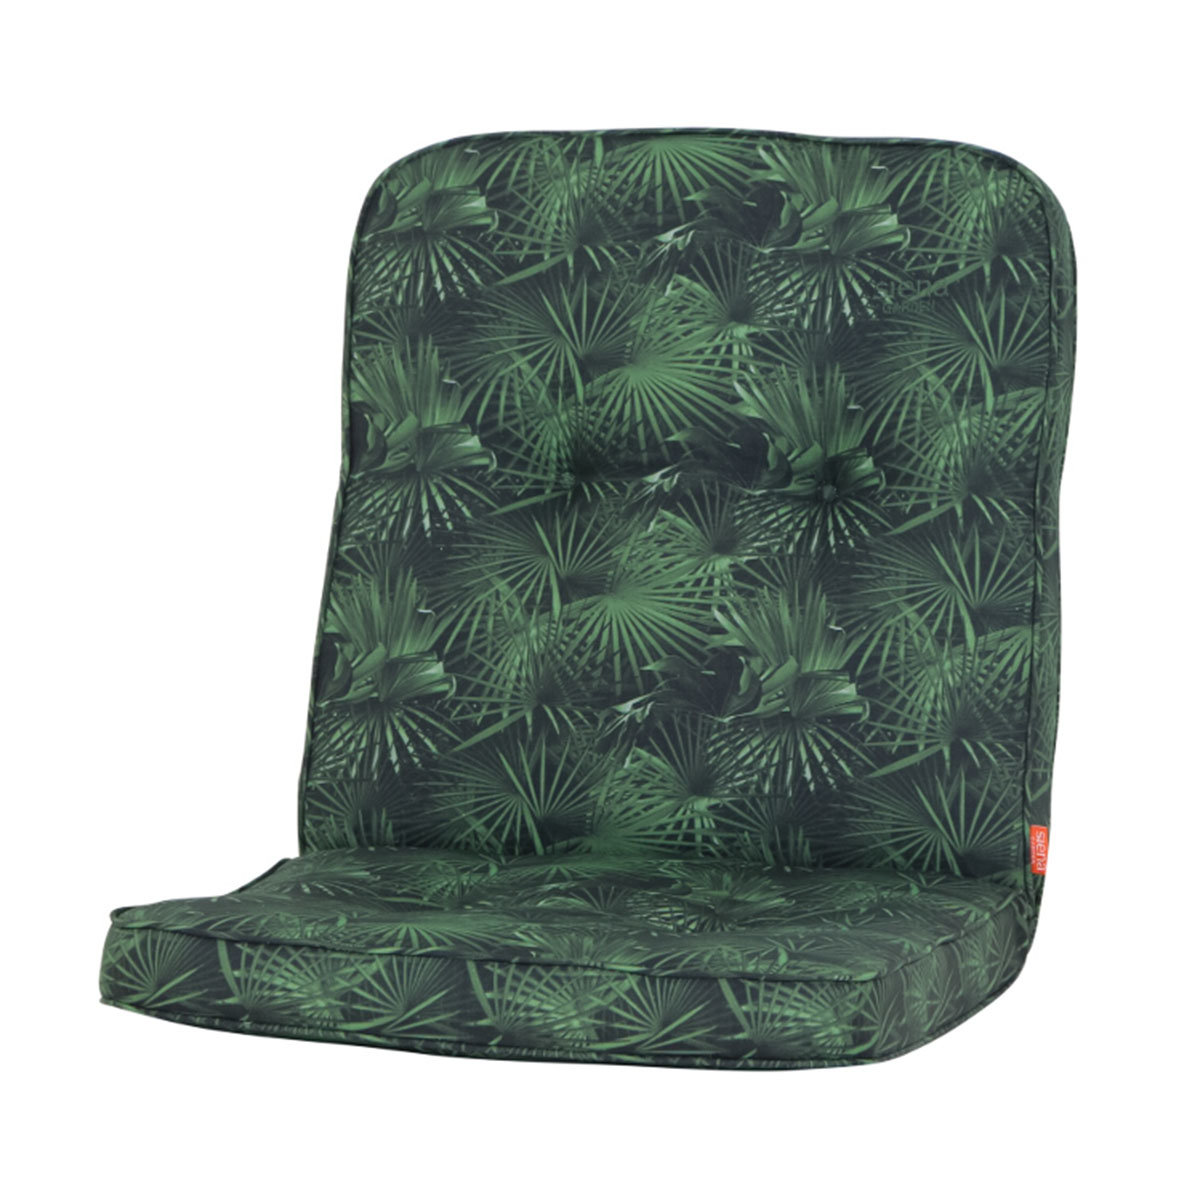 Sessel-Auflage Tarent, grüne Palme